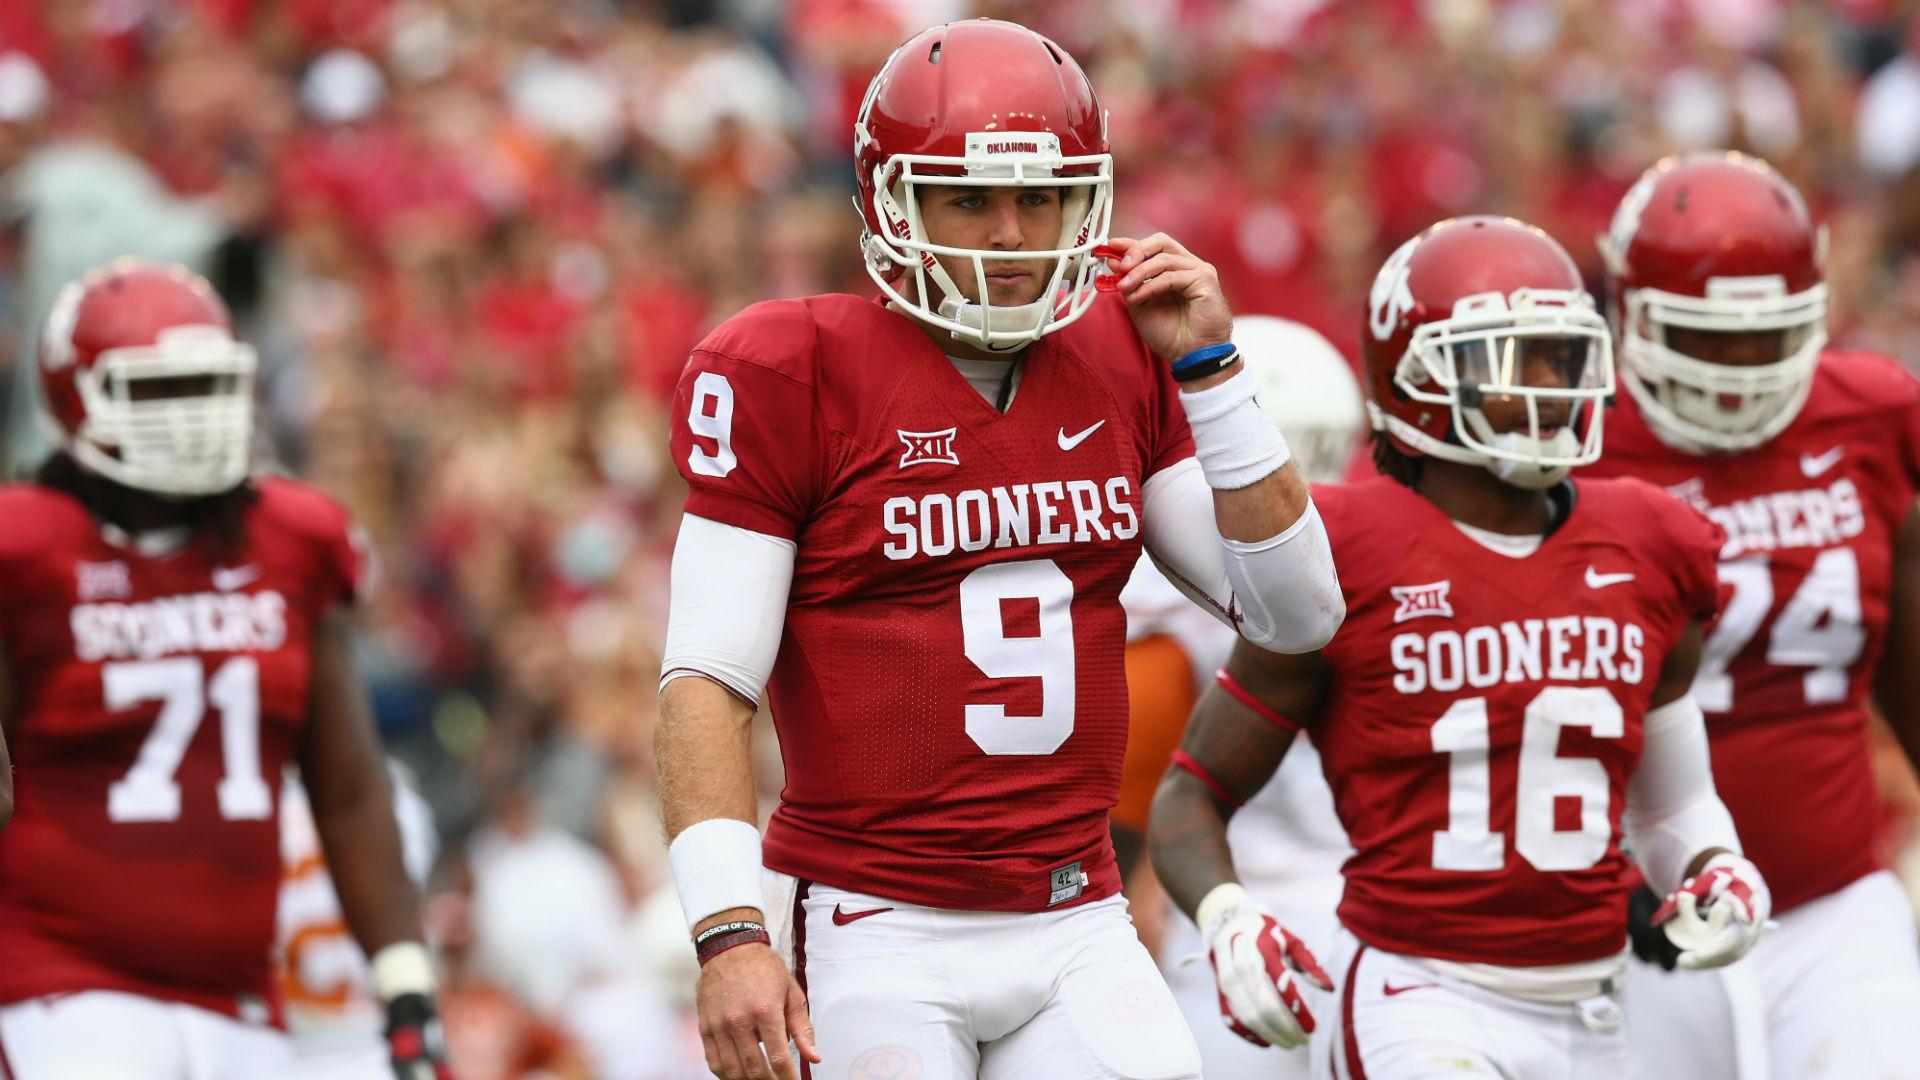 Sooners-Oklahoma-0162015-US-News-Getty-FTR